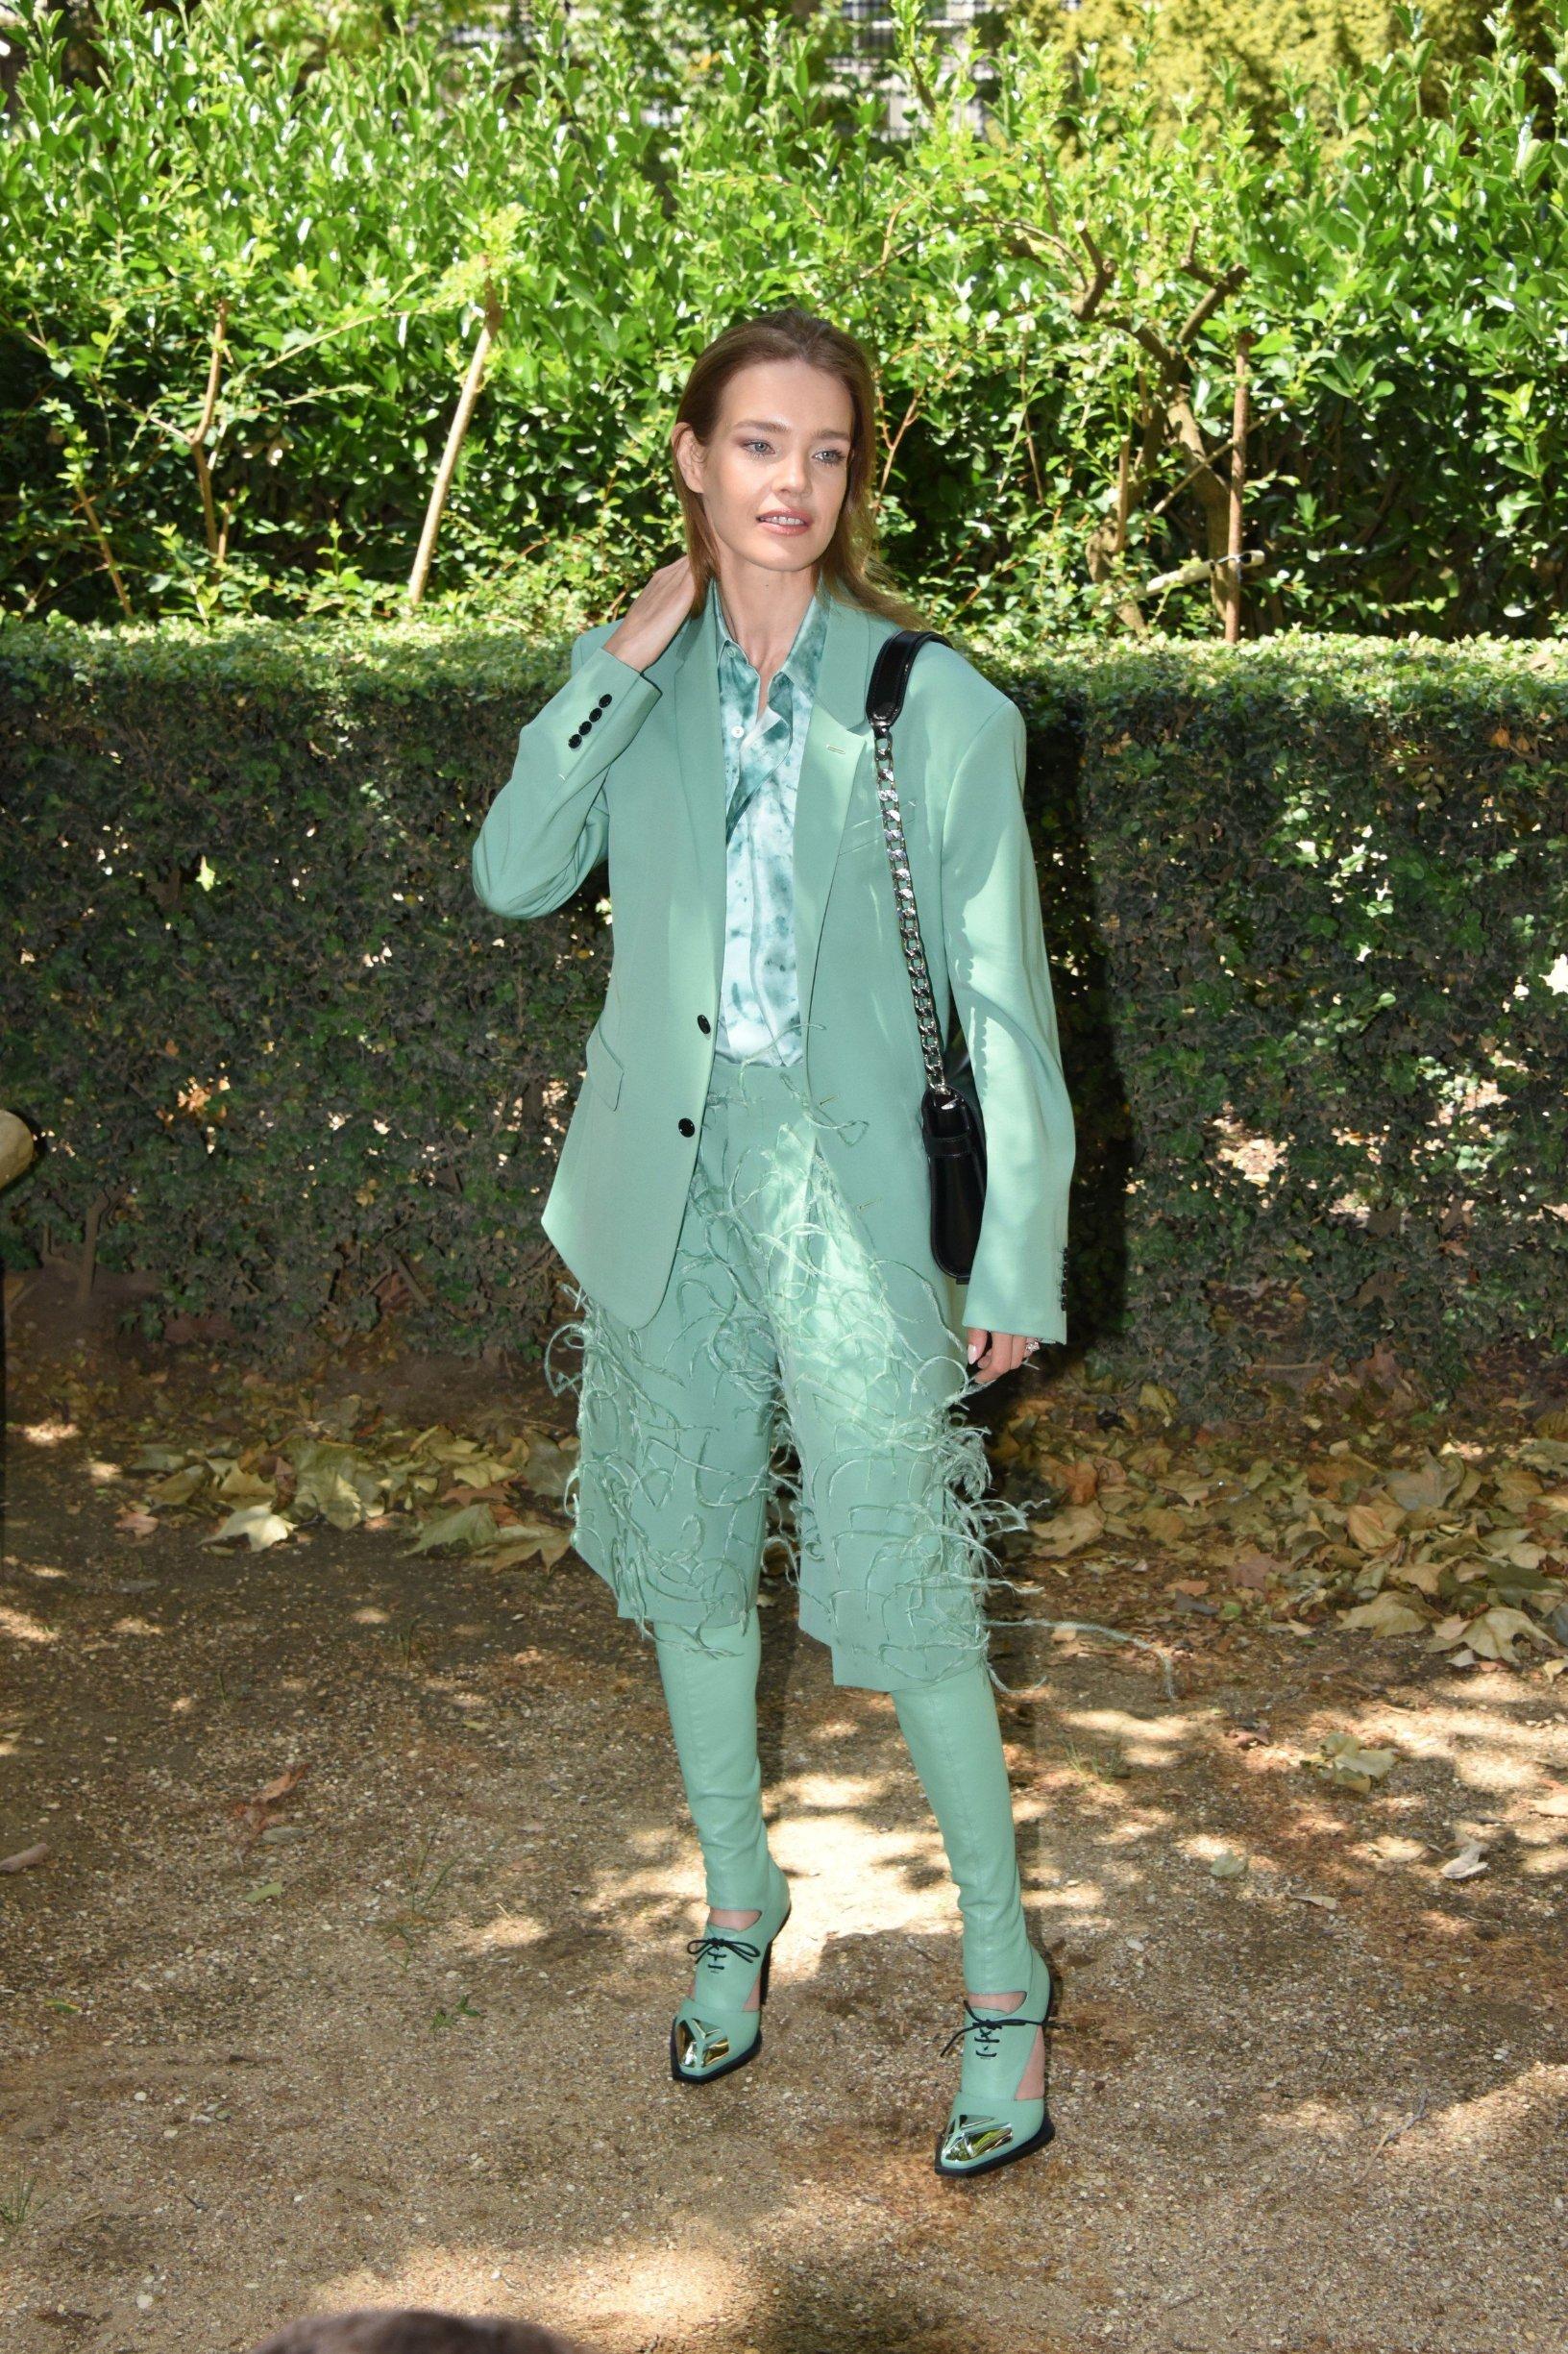 Natalia Vodianova . Berluti Fashion Show during the Spring/Summer 2020 Paris Fashion Week Menswear . 21/06/2019-Paris, FRANCE.//BENHAMOU_DSC_3308/1906220251/Credit:LAURENT BENHAMOU/SIPA/1906220300, Image: 450506143, License: Rights-managed, Restrictions: , Model Release: no, Credit line: Profimedia, TEMP Sipa Press